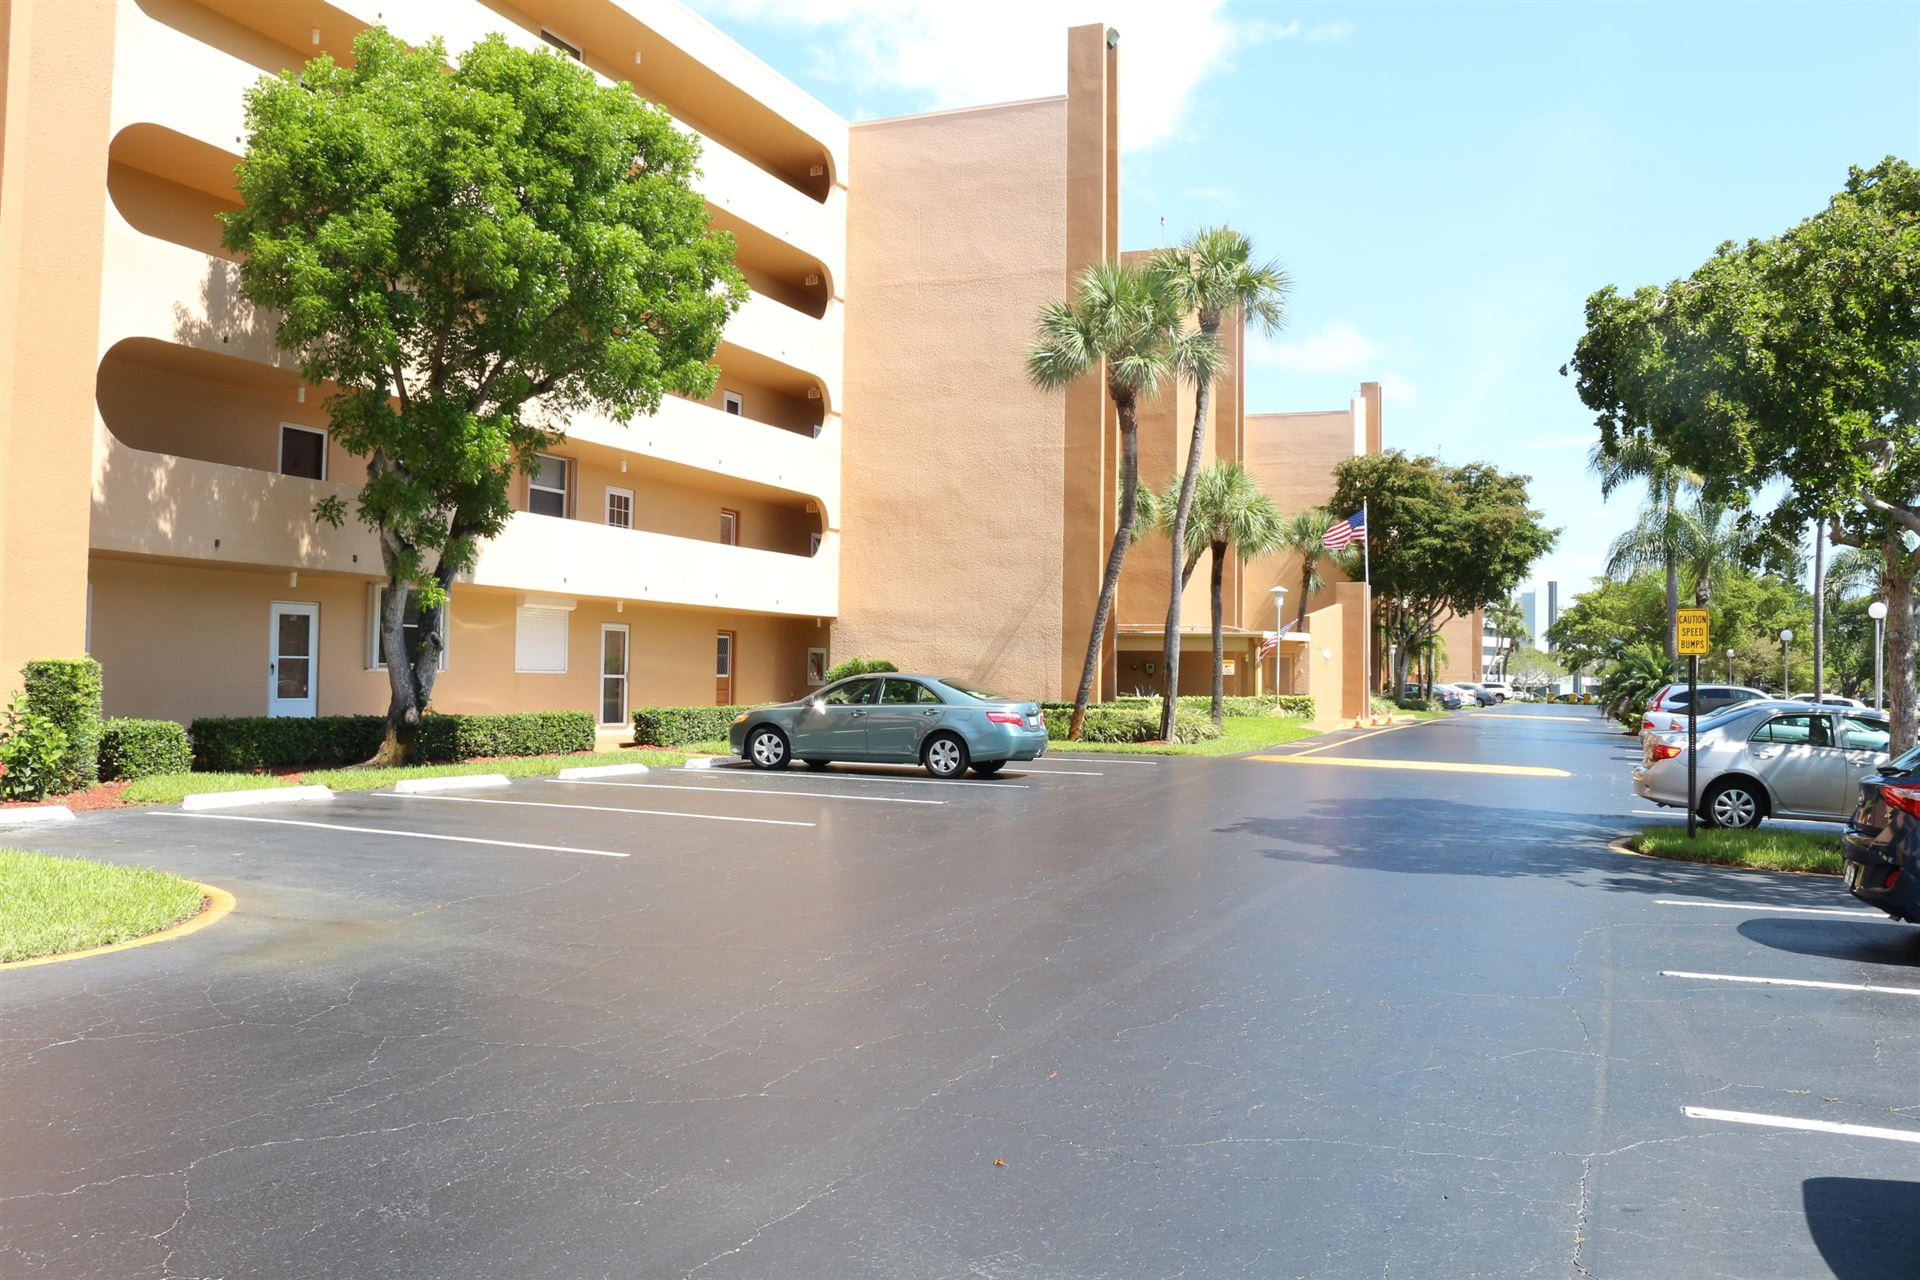 6461 NW 2nd Avenue #112, Boca Raton, FL 33487 - #: RX-10571199